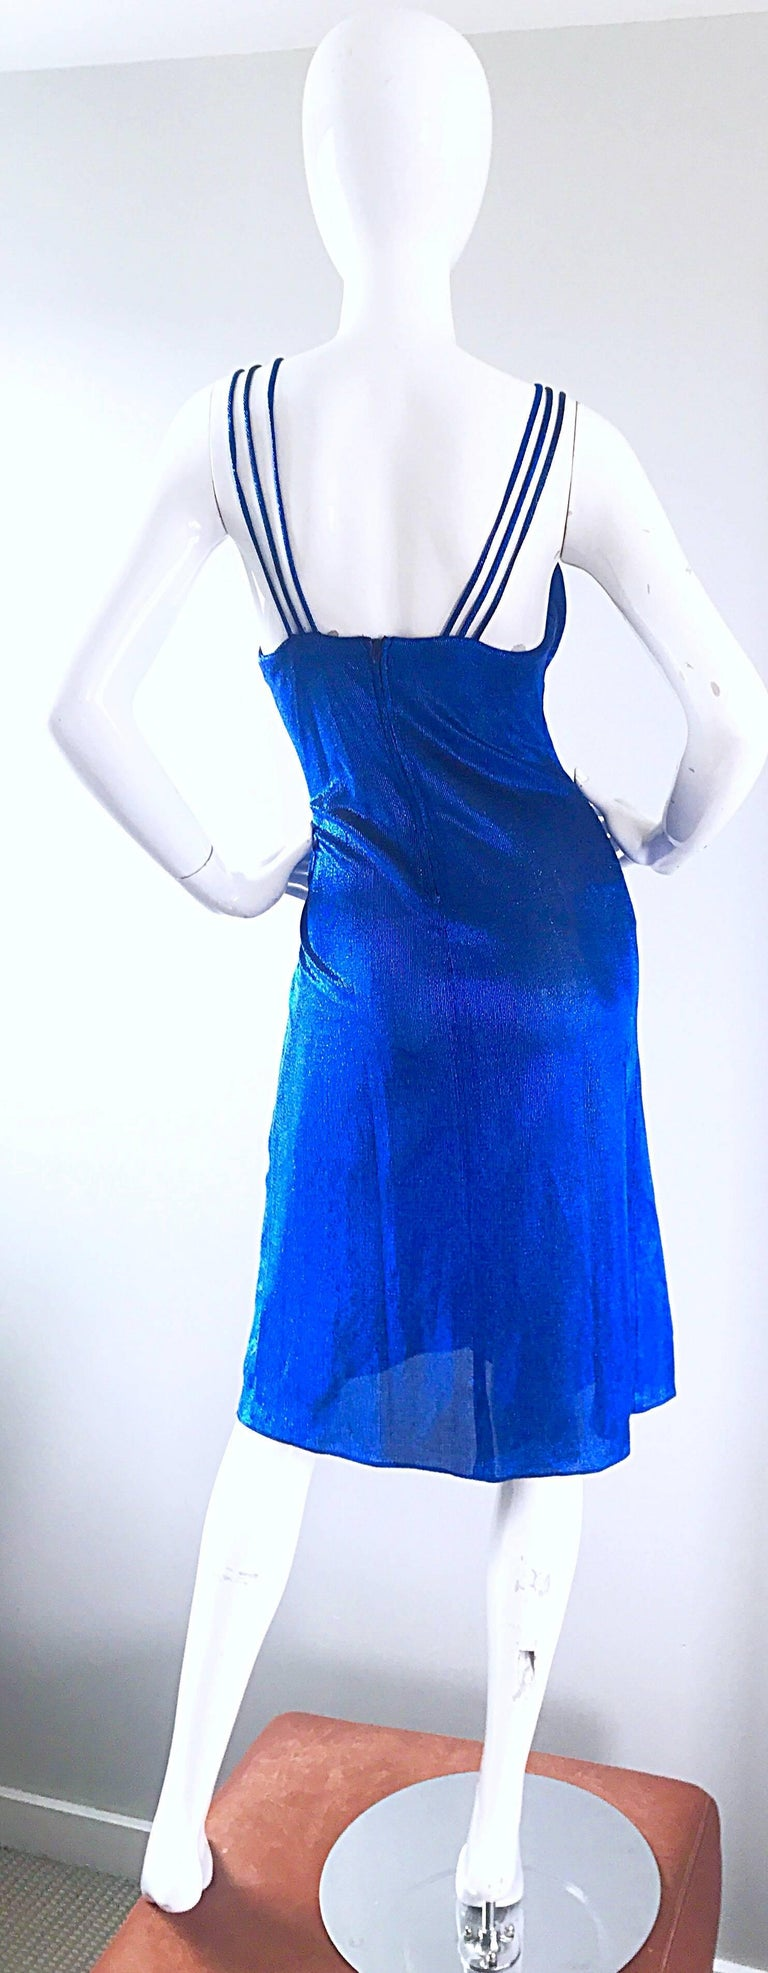 Women's 1970s Samir Sexy Electric Blue Metallic Cut - Out Slinky Vintage 70s Disco Dress For Sale